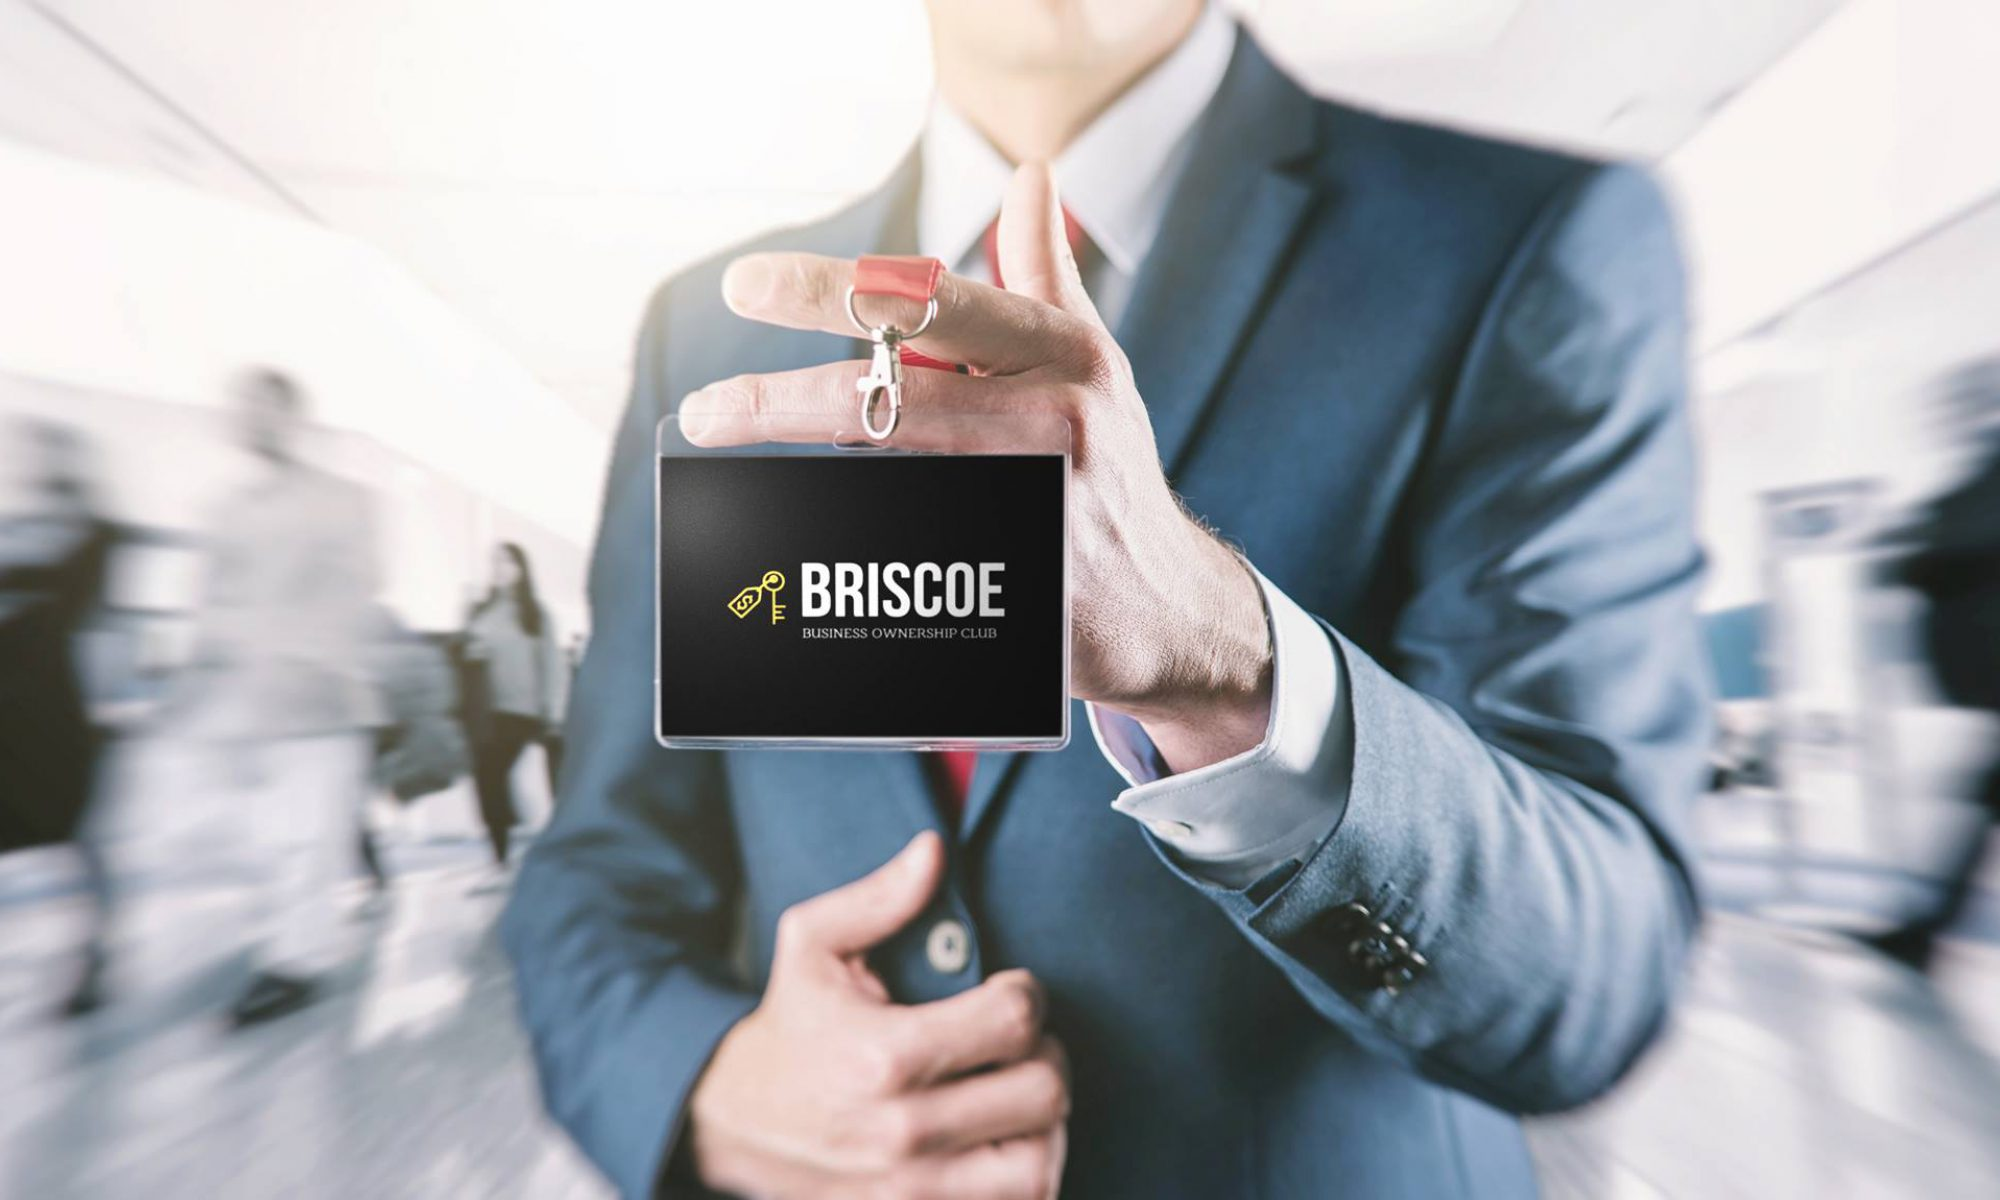 Briscoe Business ownership club